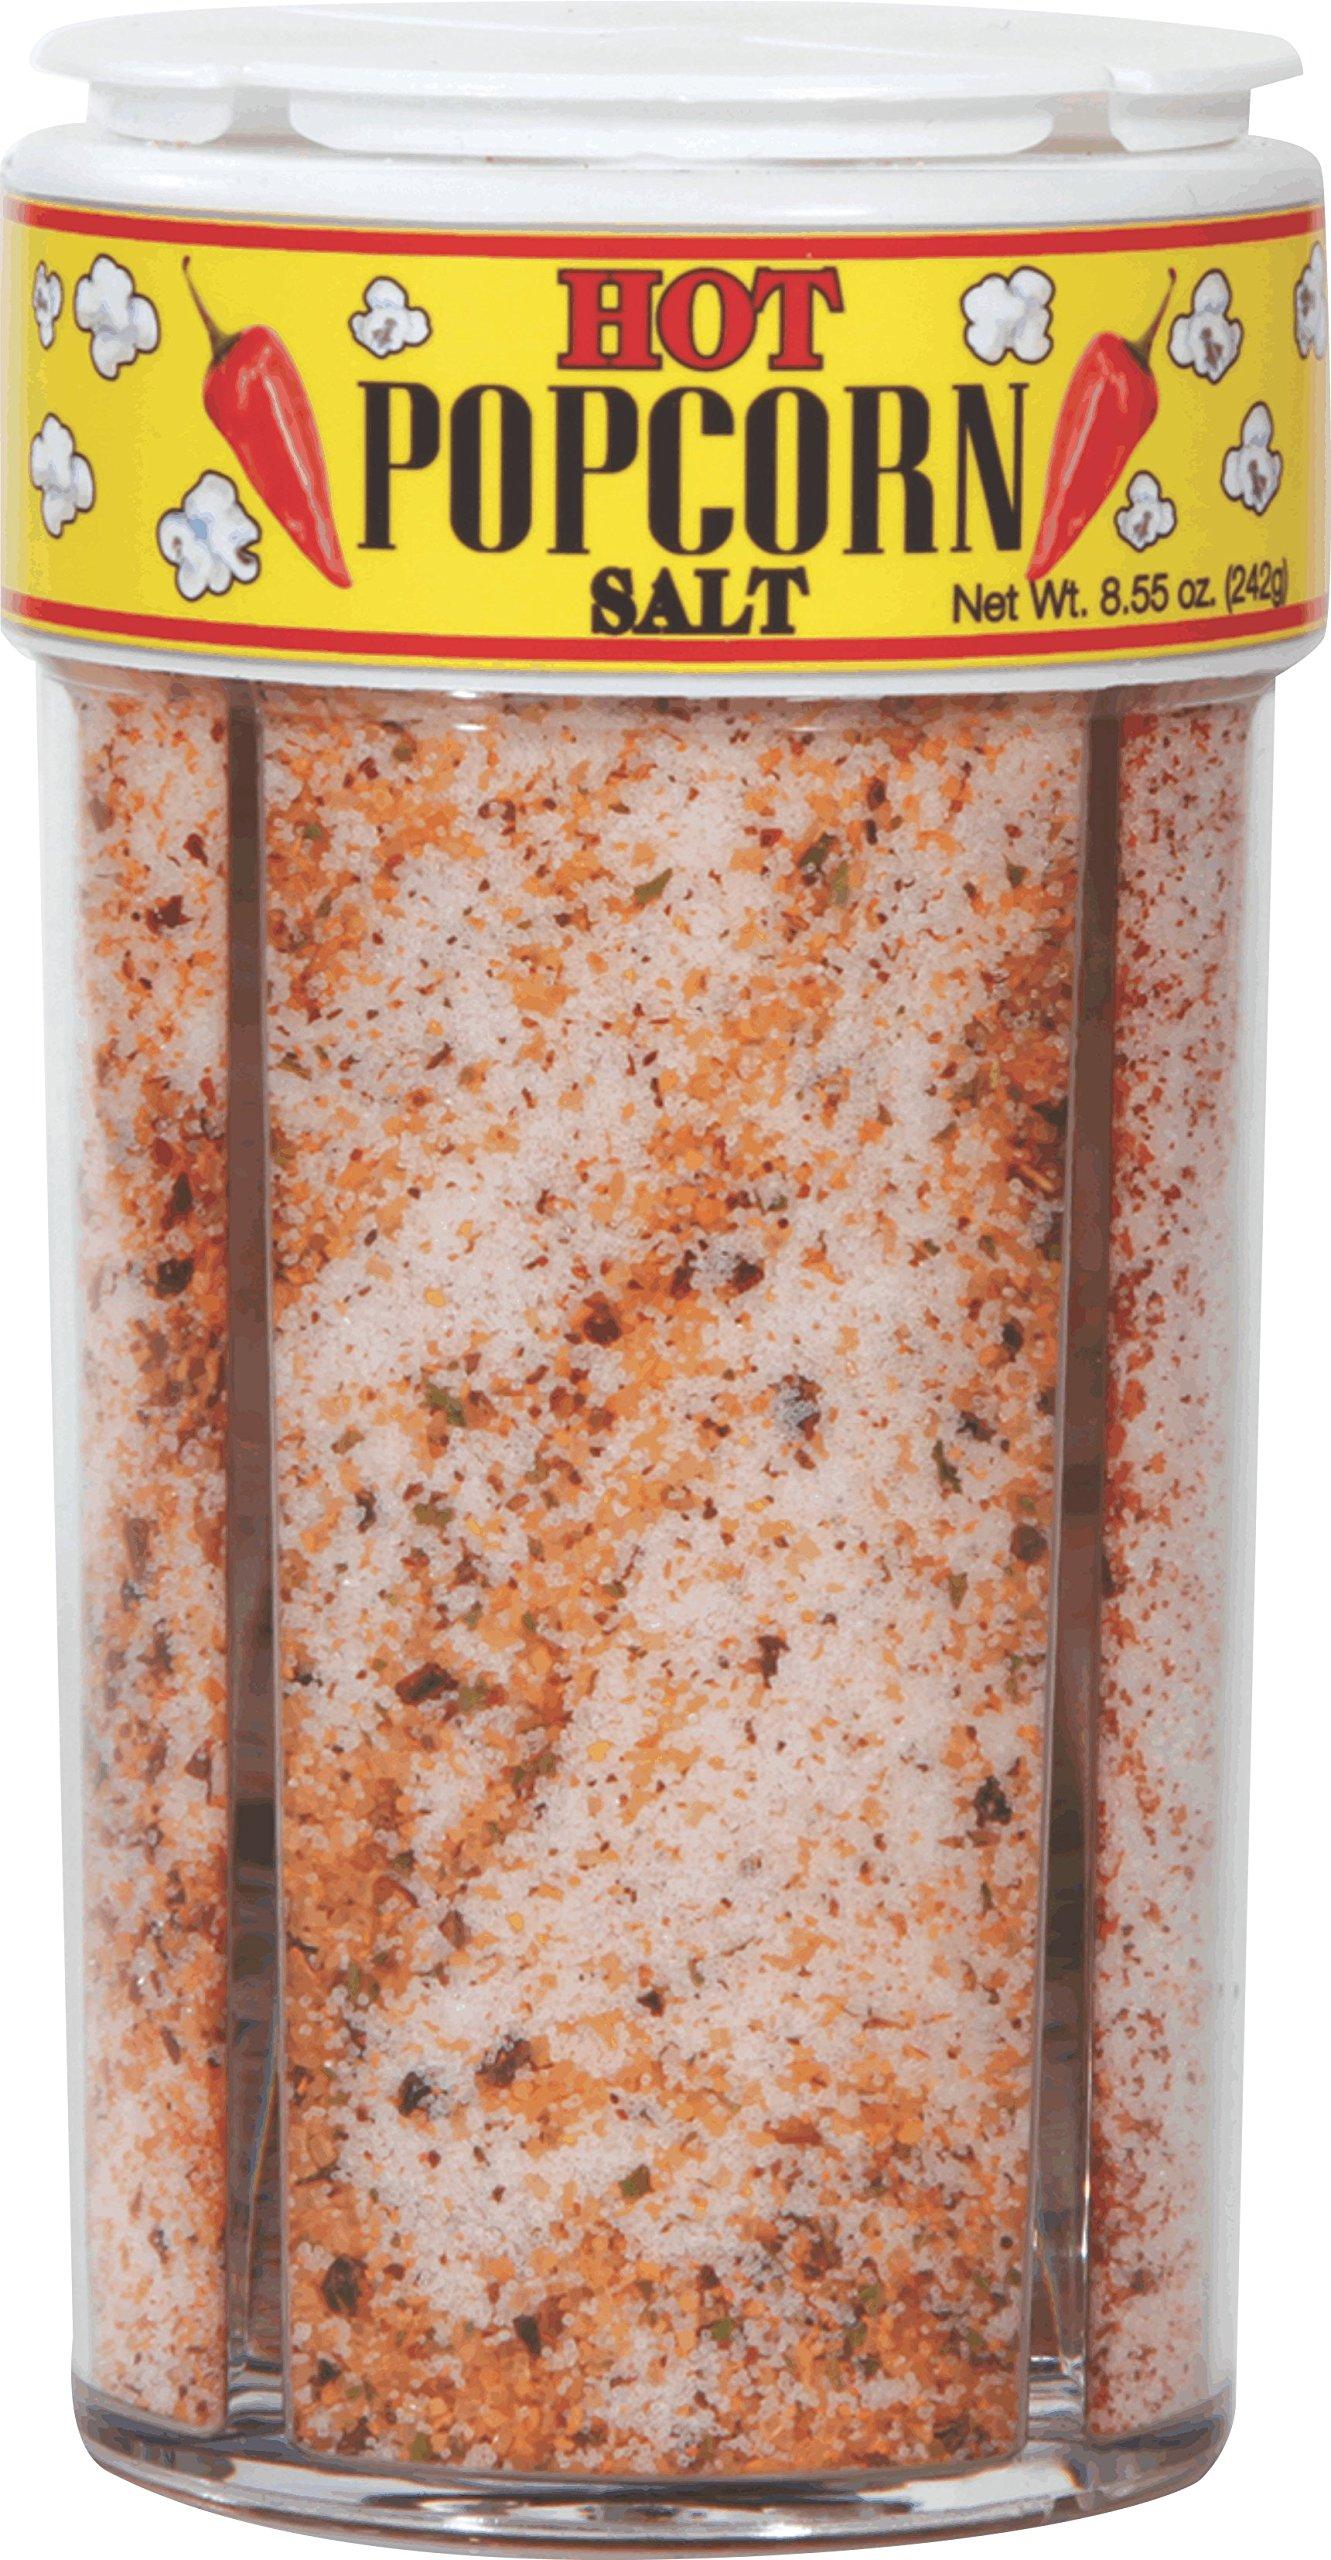 Dean Jacob's Hot Popcorn Salts by Dean Jacob's